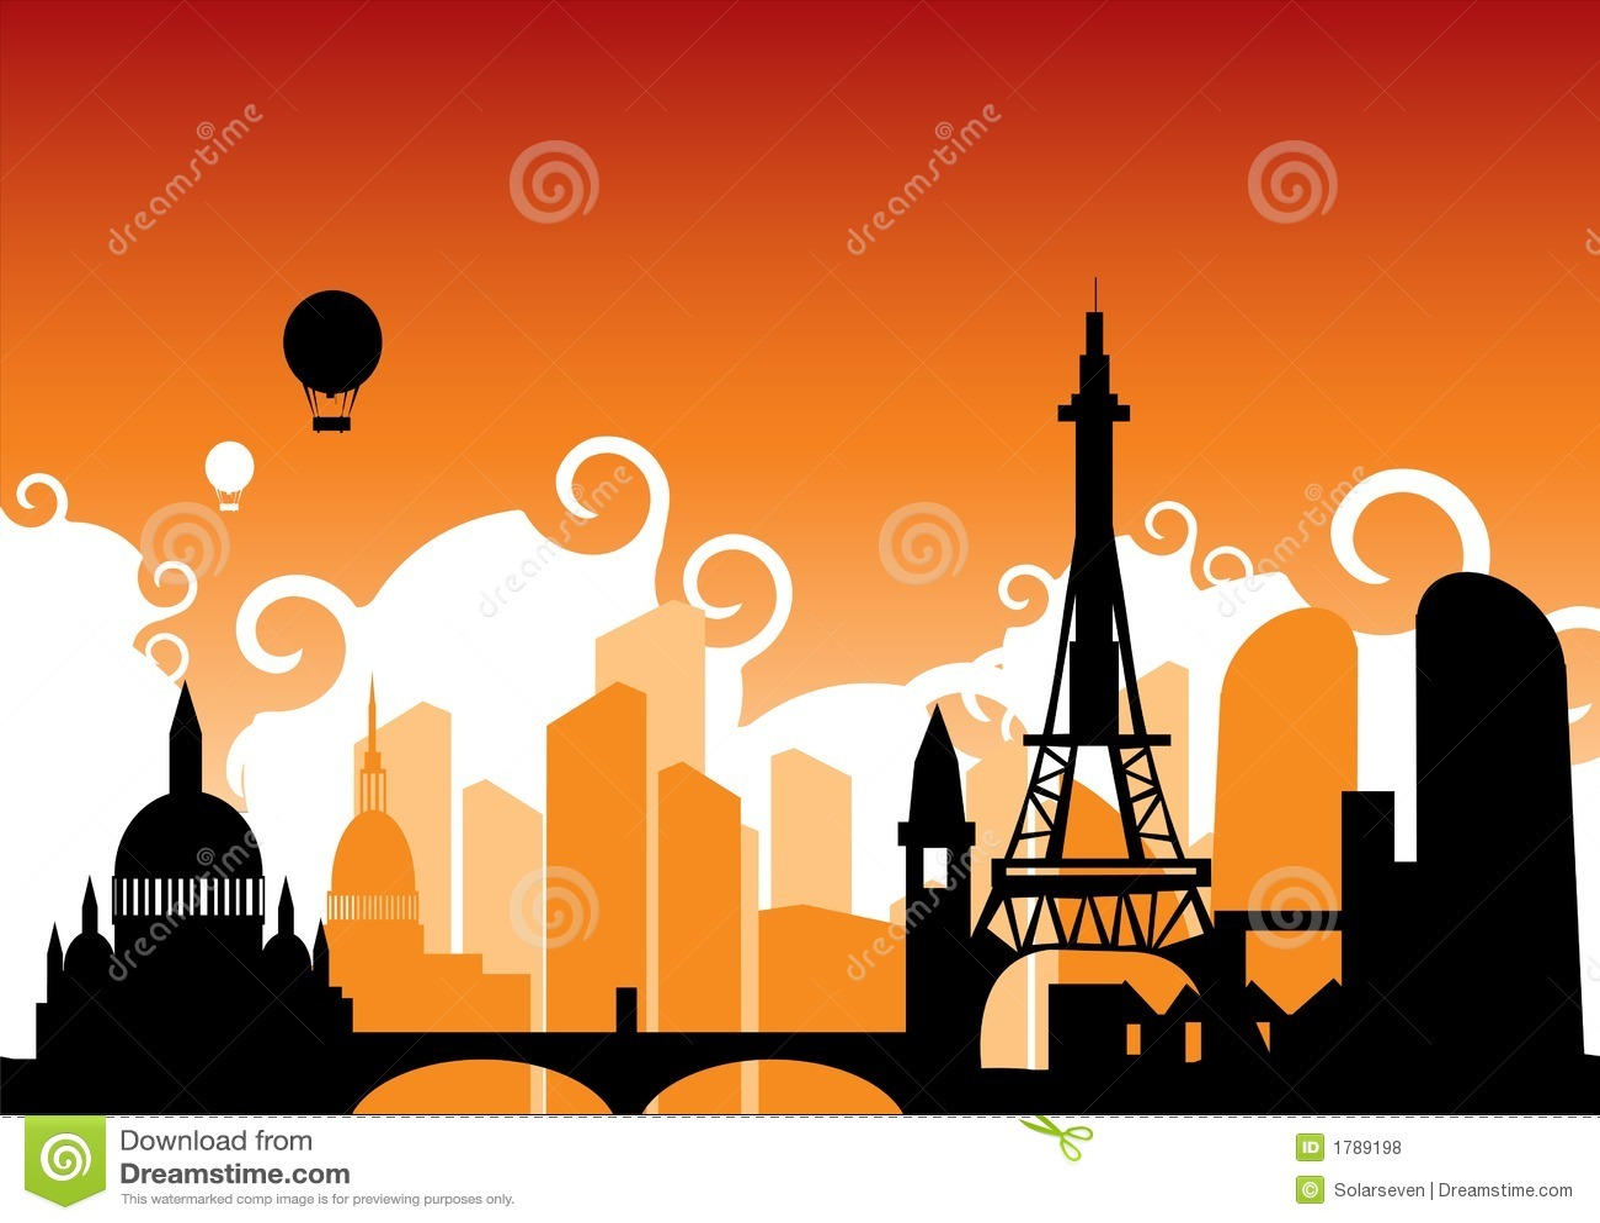 Old paris street map royalty free stock photo image 15885665 - Paris Skyline Royalty Free Stock Photos